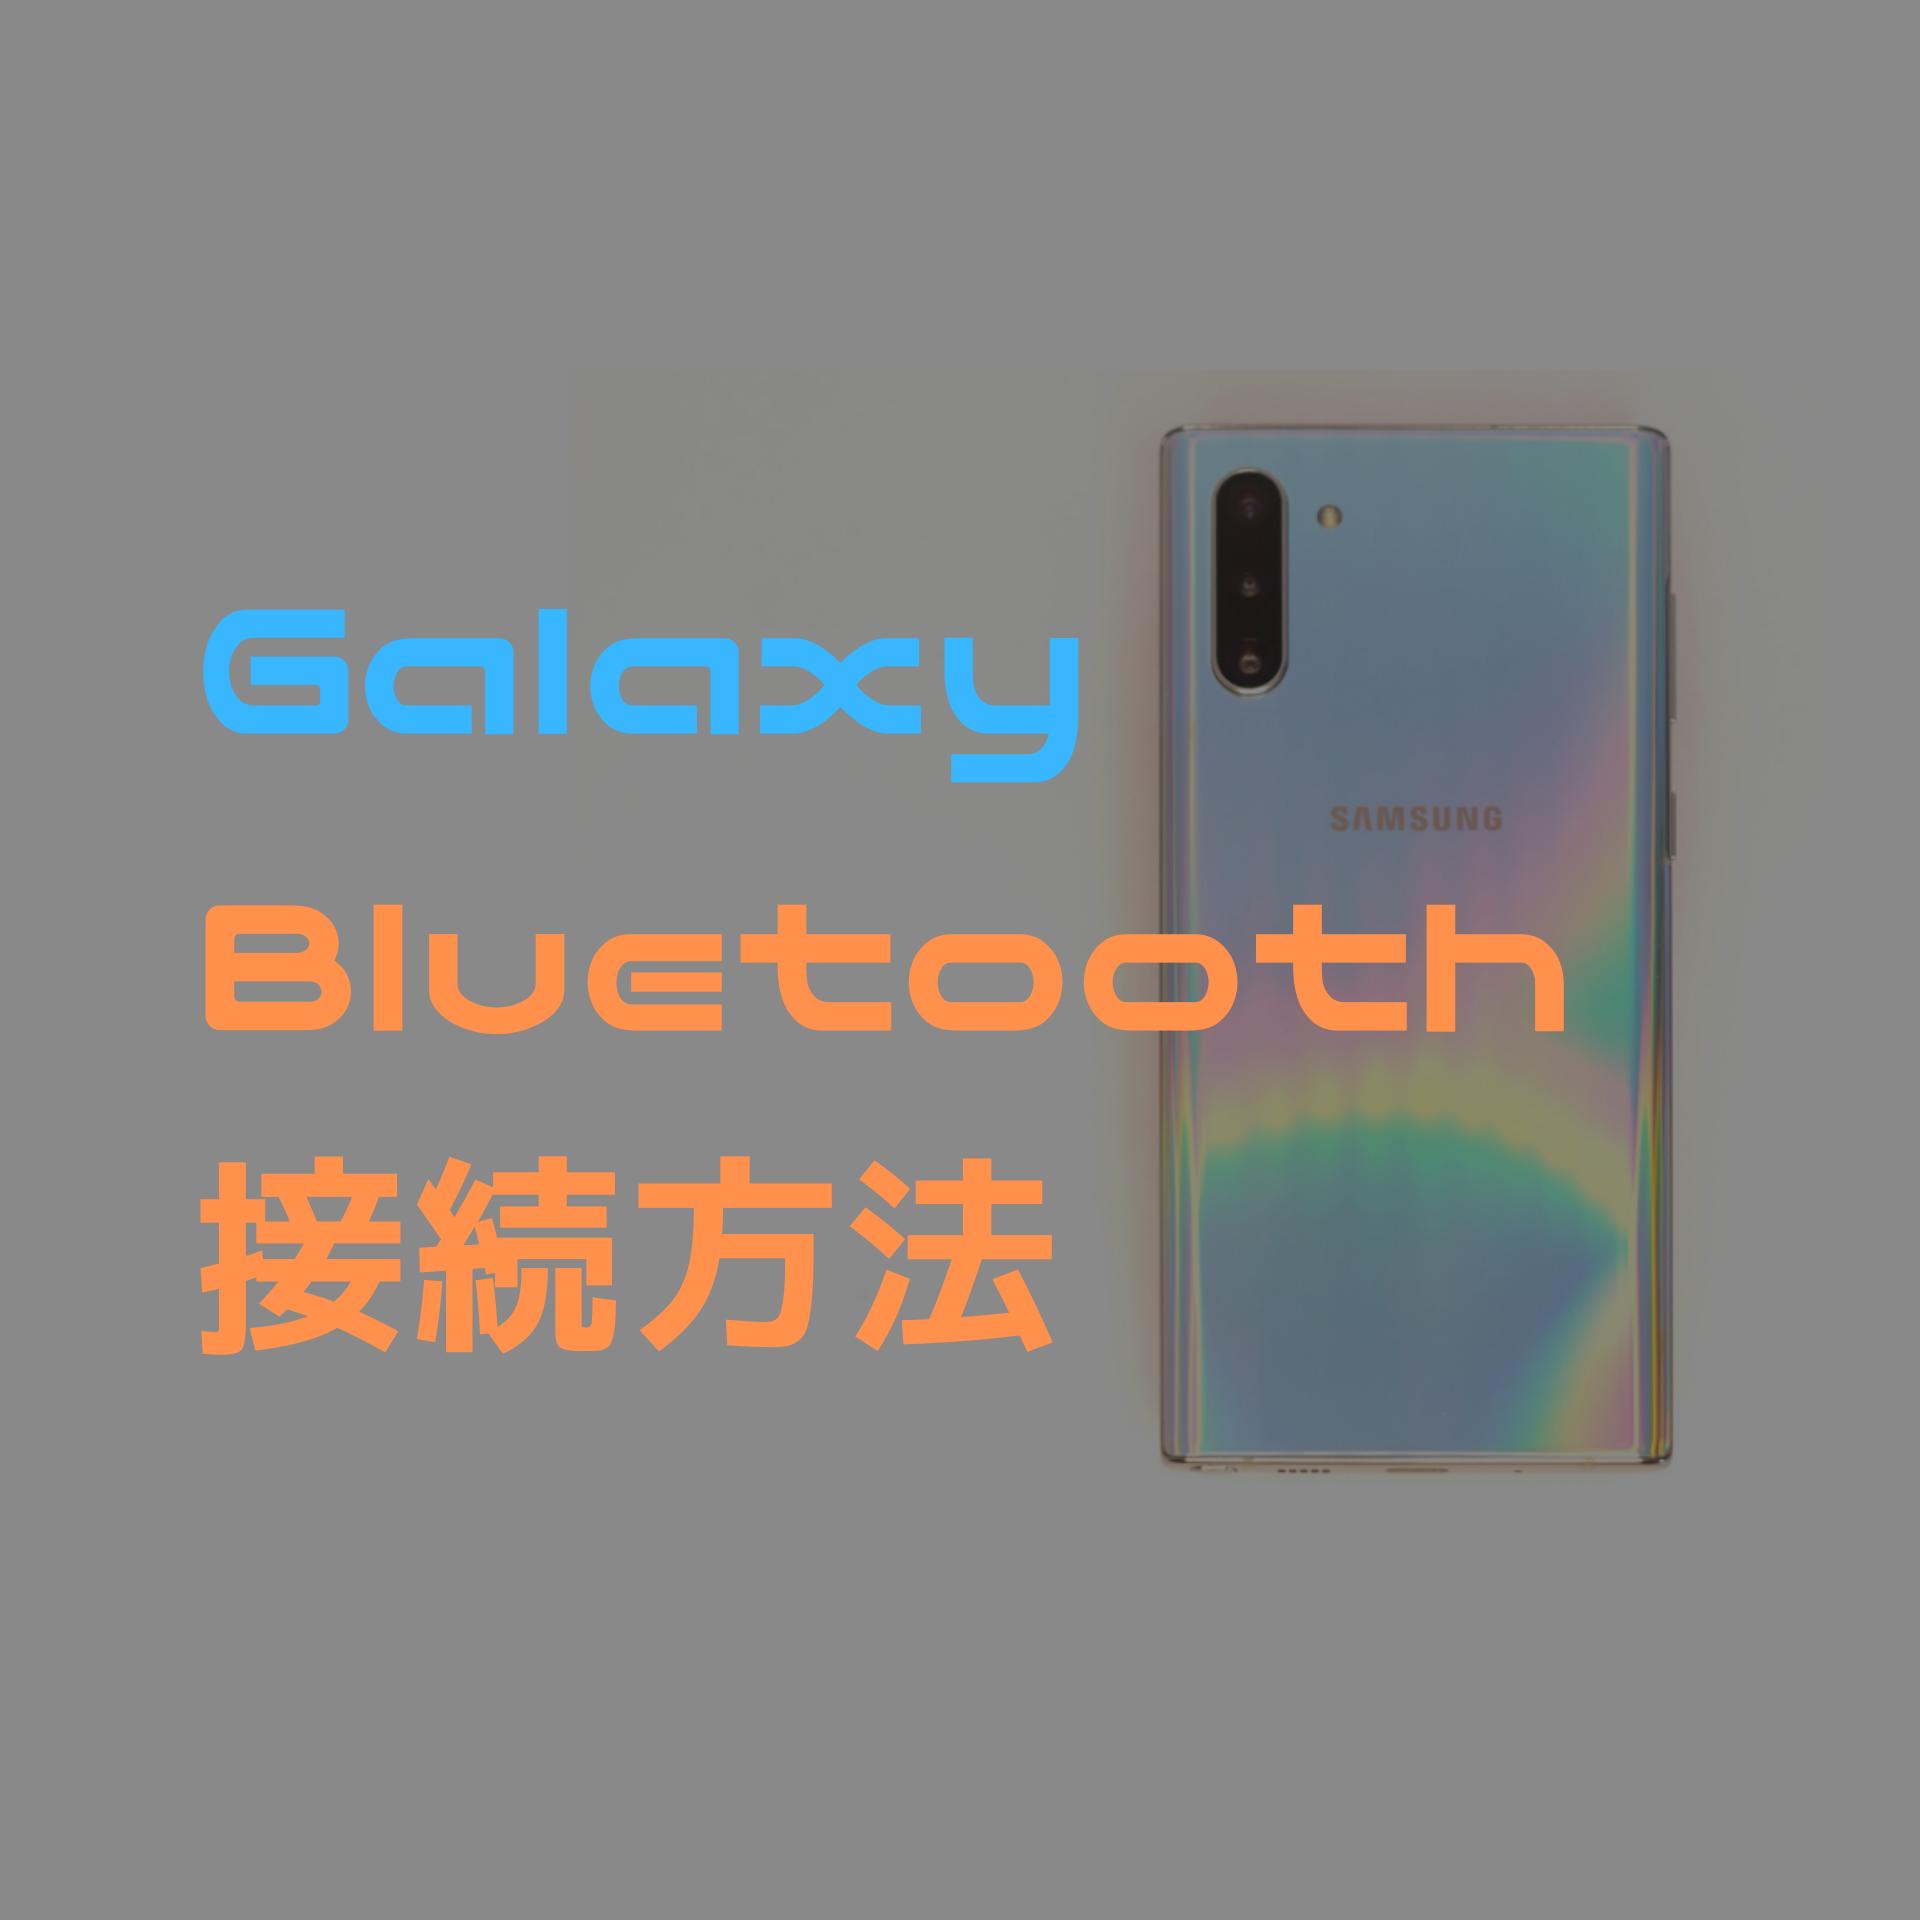 【Galaxy】Bluetoothによる機器の接続方法